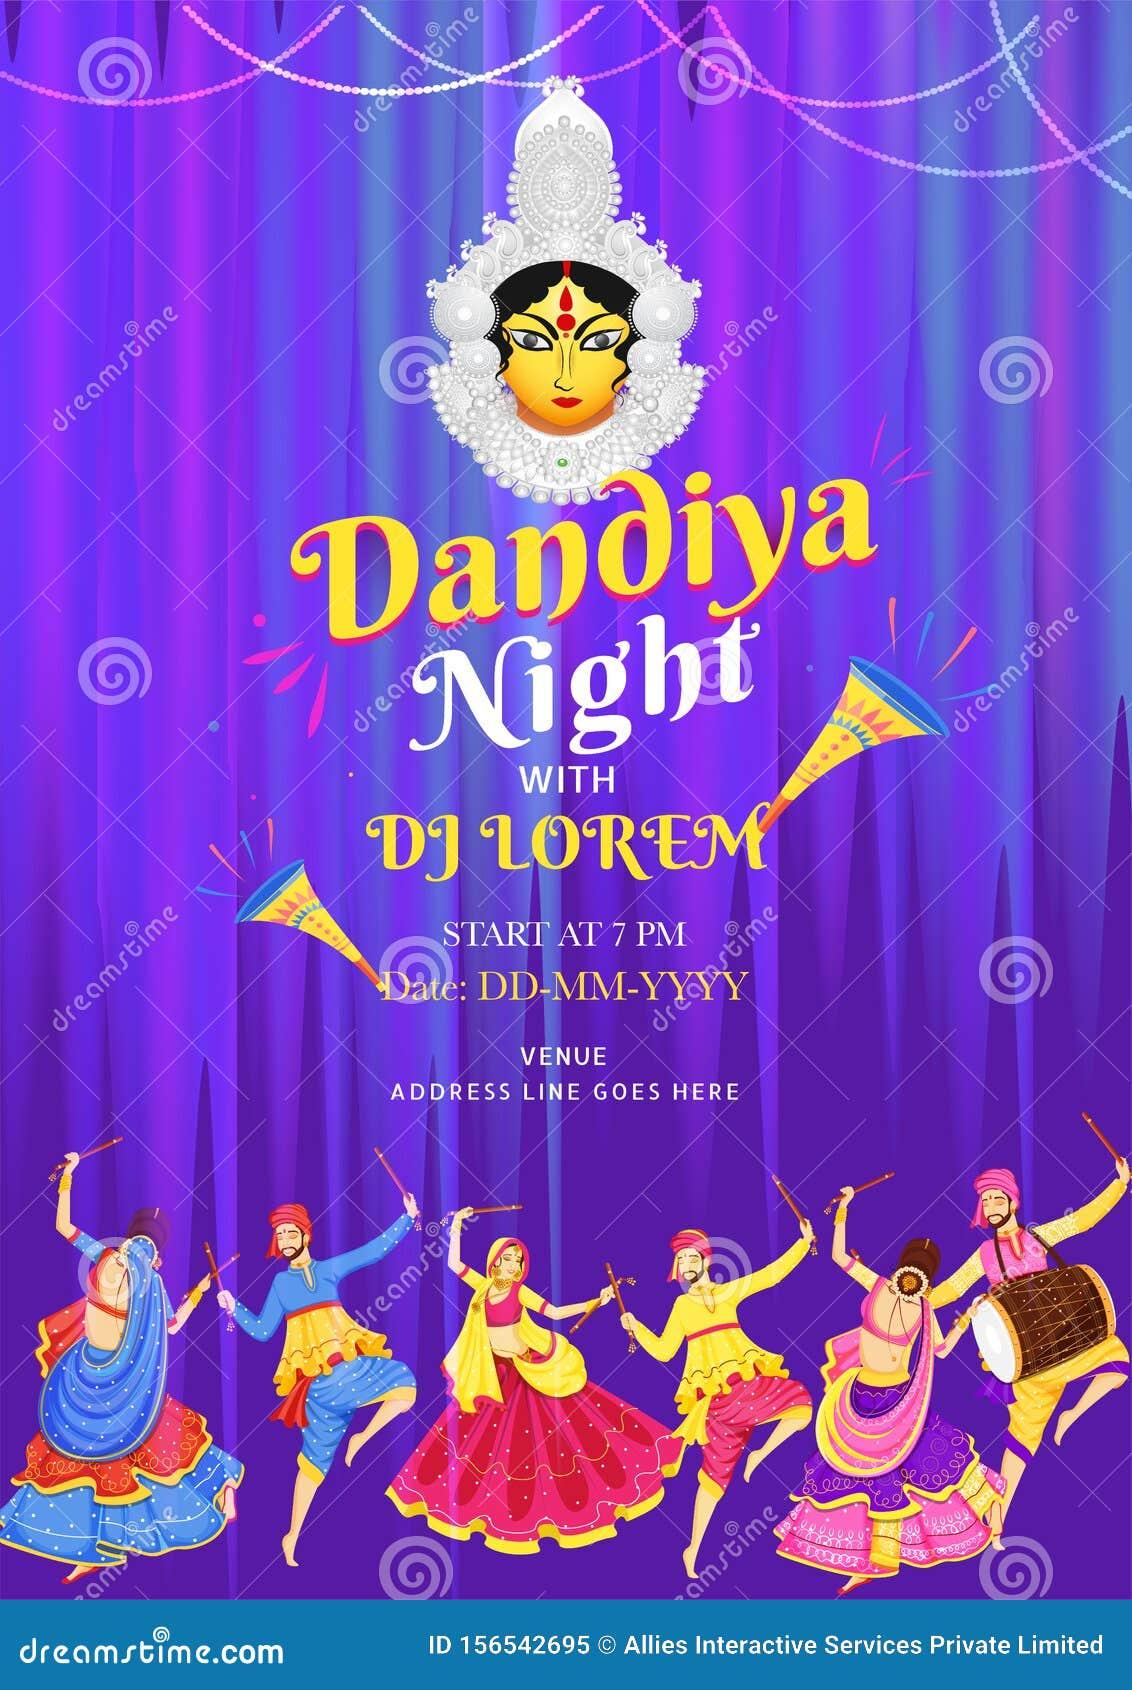 Dandiya Night Dj Party Invitation Card Design With